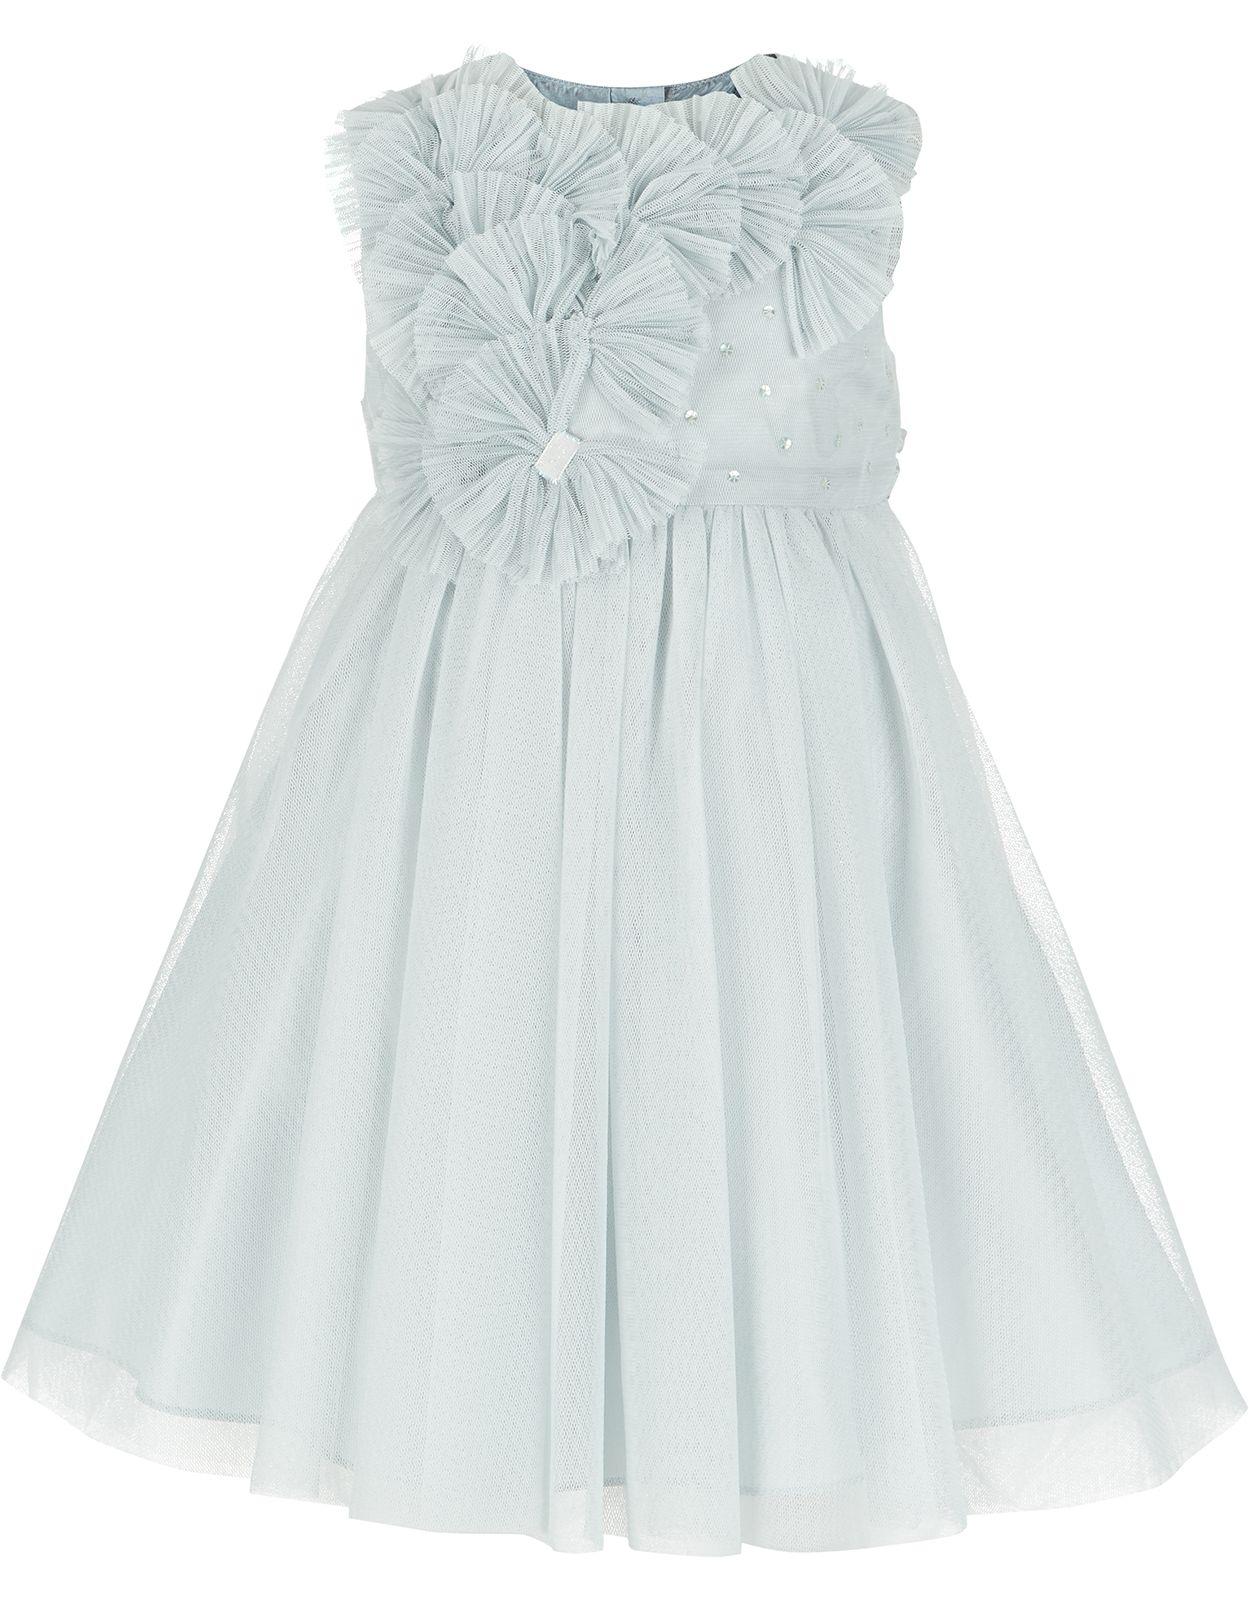 Pihlan mekko